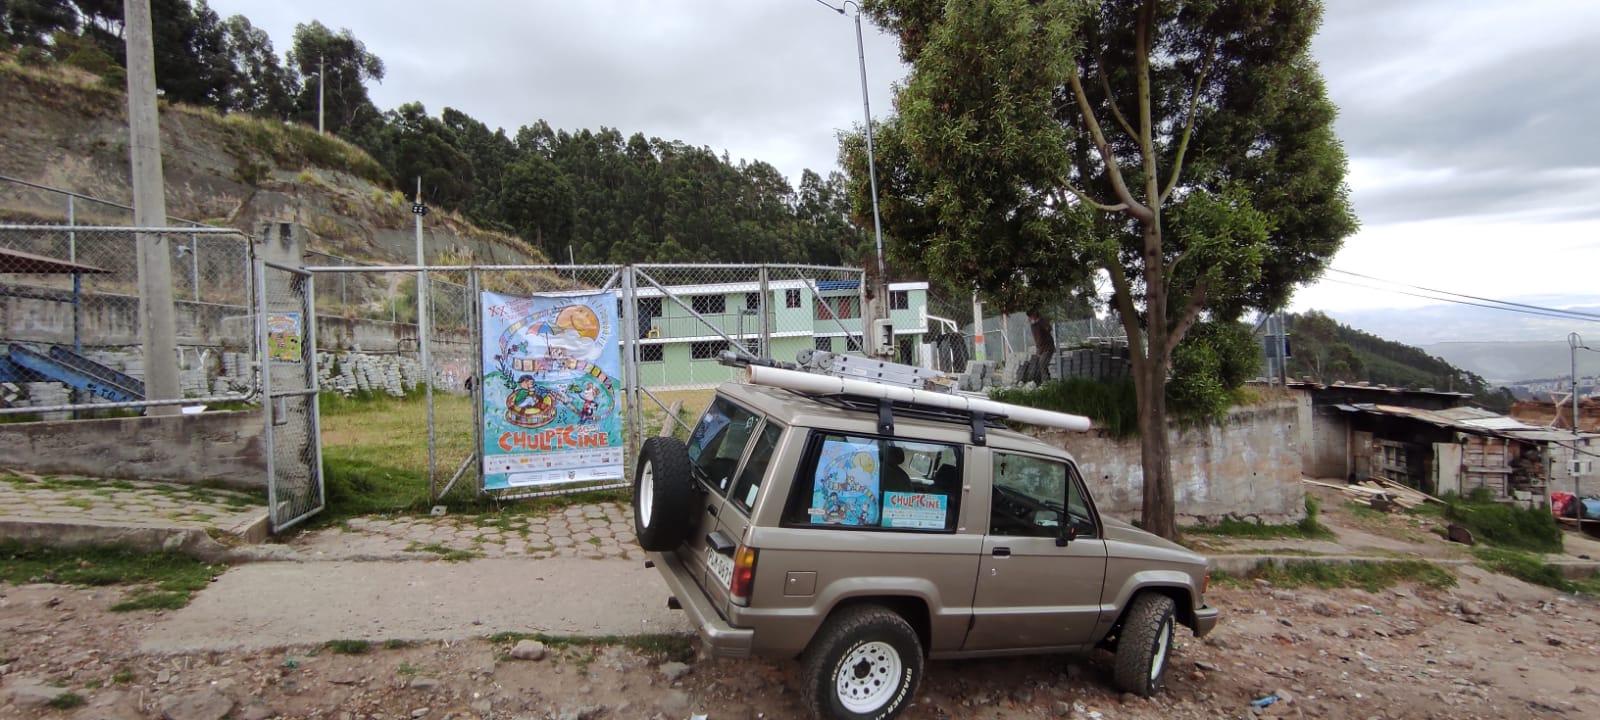 XX Festival Infantil y Juvenil Chulpicine 2021 inició su recorrido